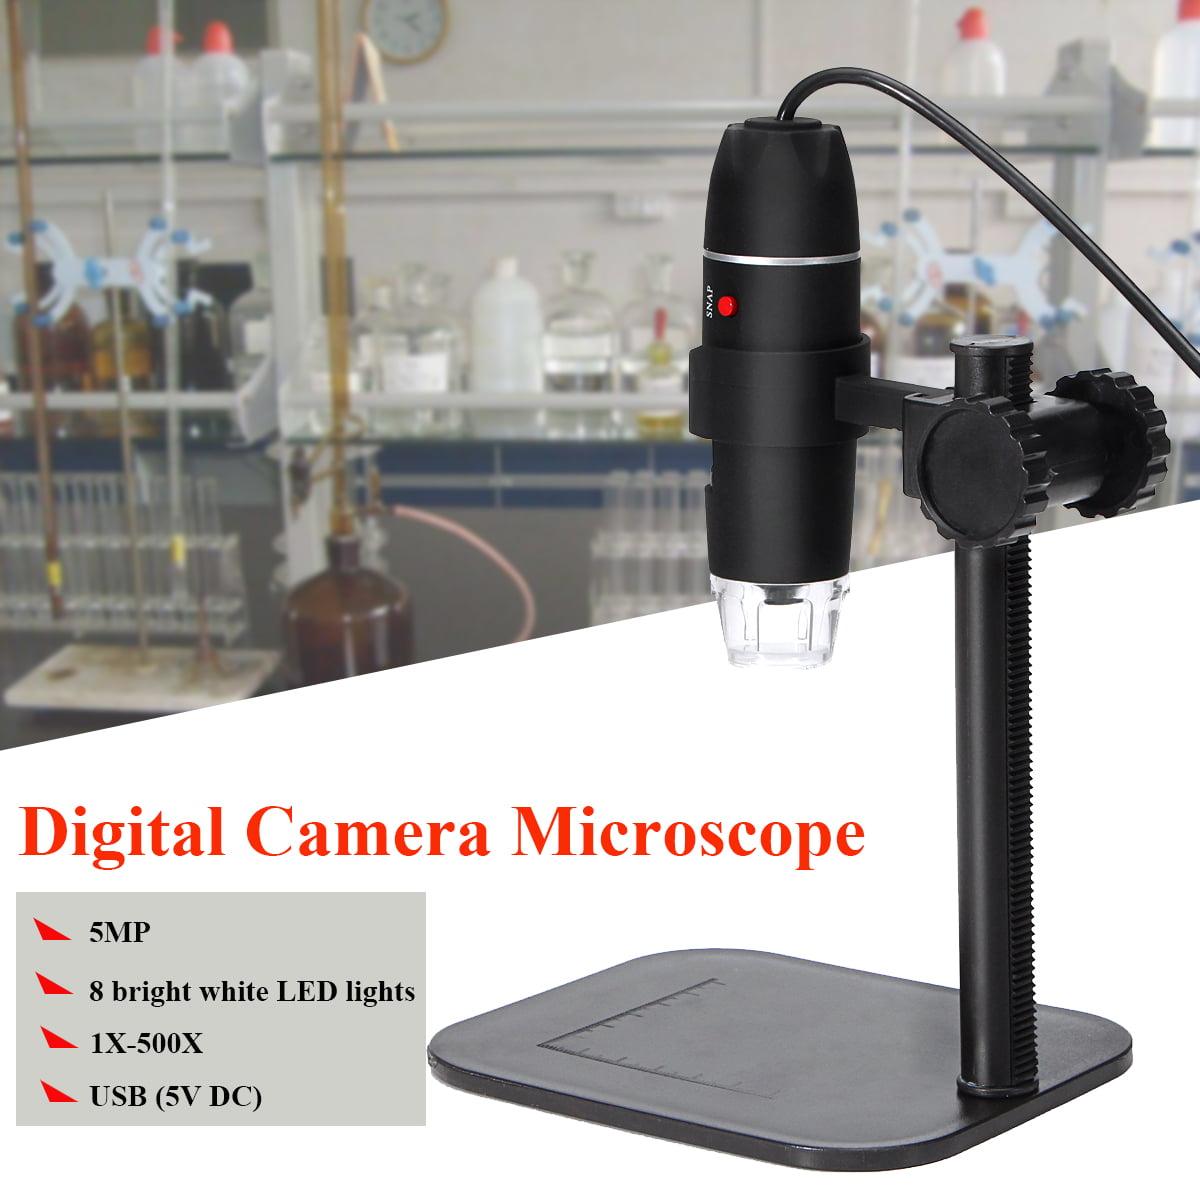 5.0MP 8 LED USB Digital Camera Microscope Magnifier Camera Vidio 1X-500X 5V DC by